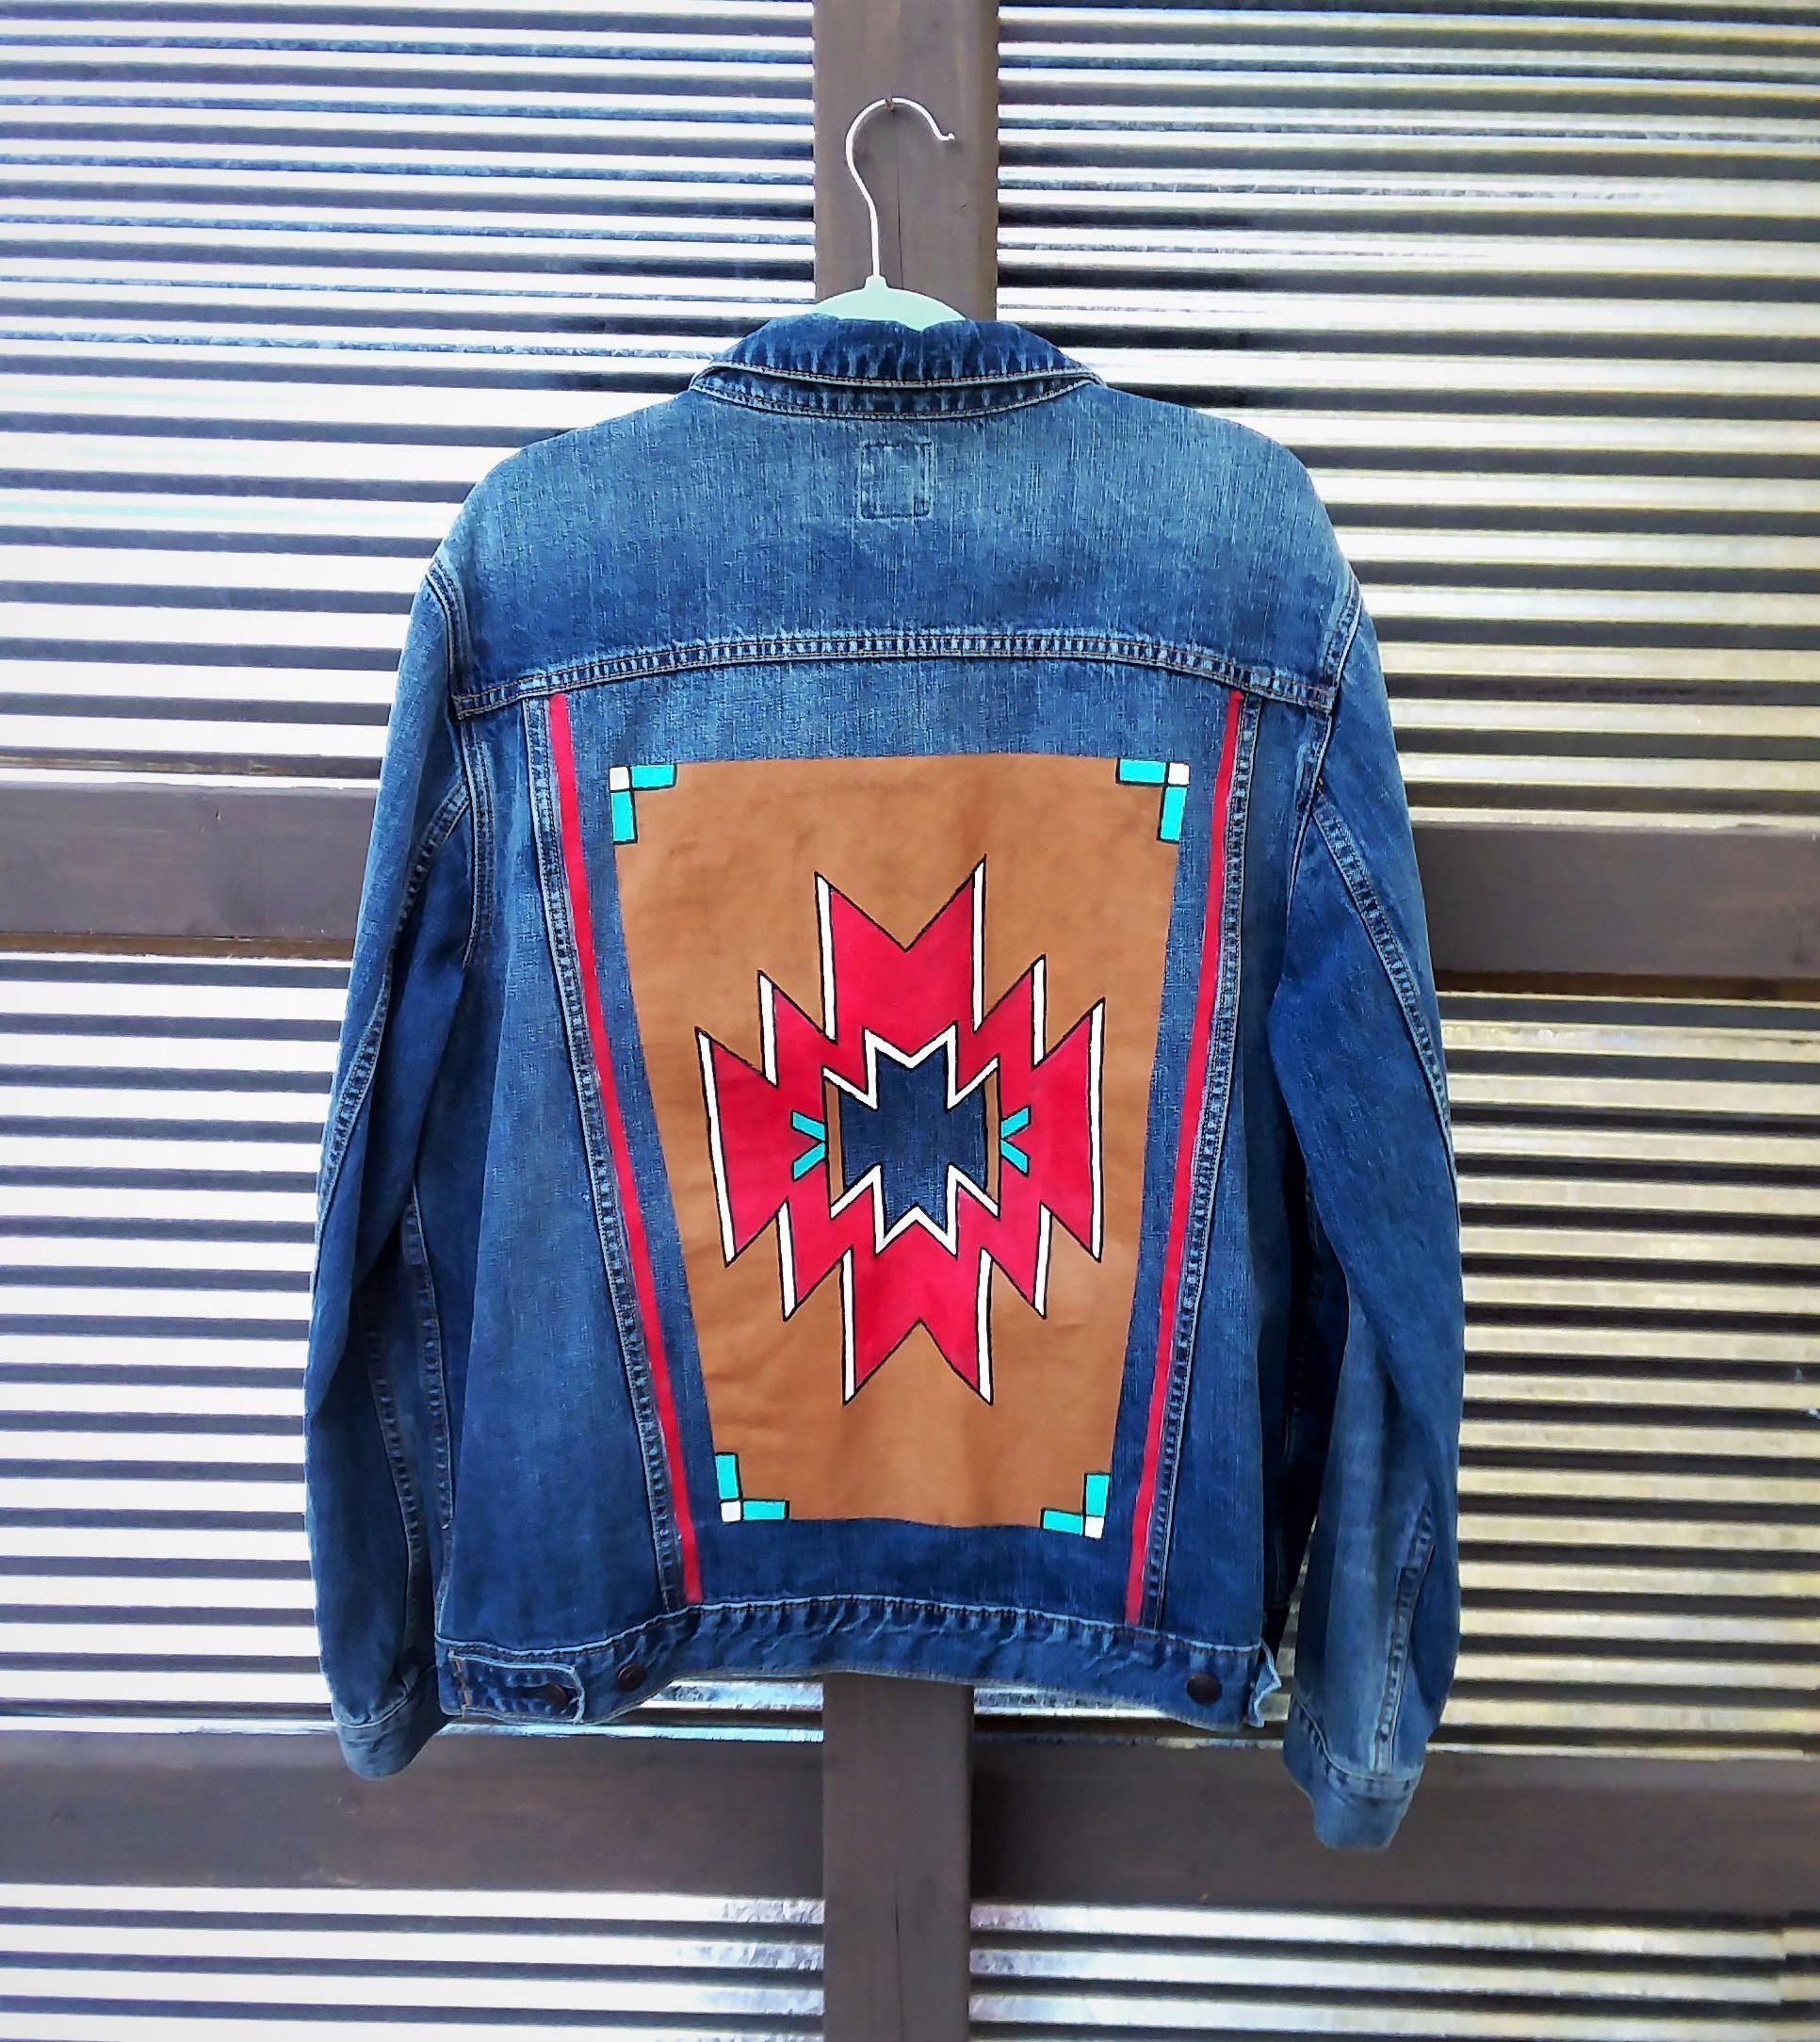 Hand Painted Southwest Blanket On Denim Jean Jacket By Bleudoor On Instagram Denim Country Hand Painted Denim Jacket Jackets [ 2168 x 1932 Pixel ]